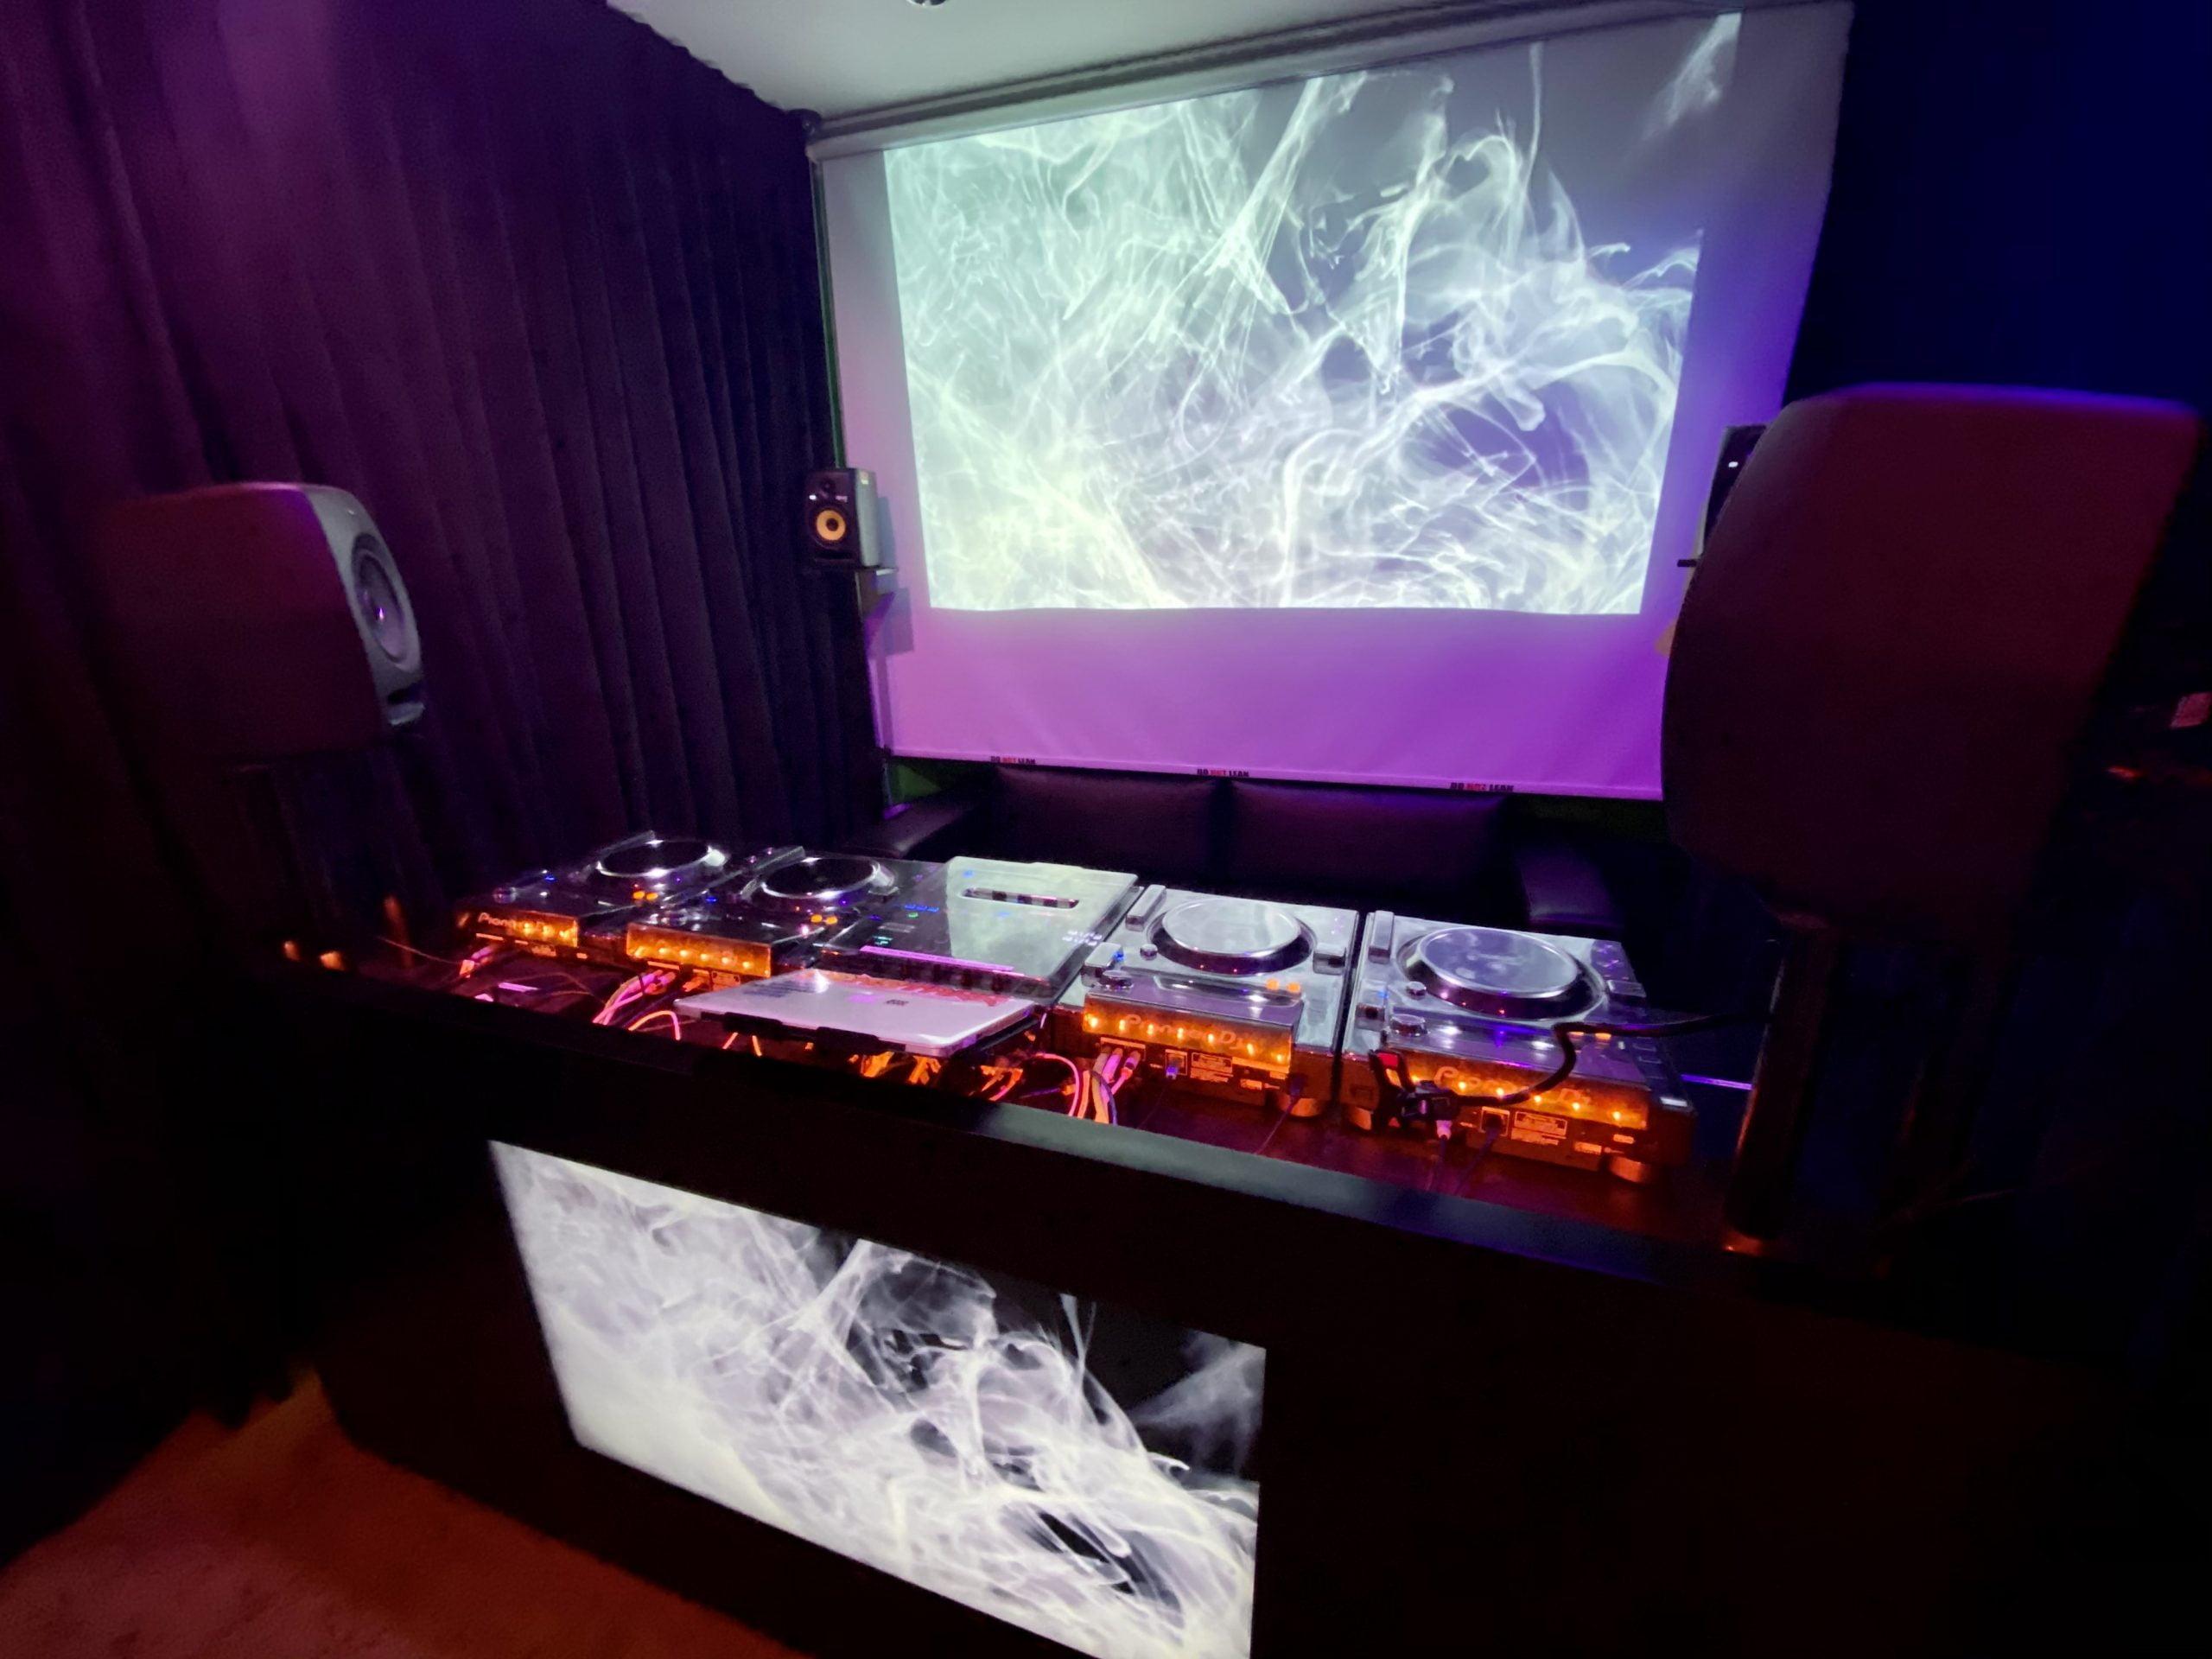 https://ministryofdjs.com.sg/wp-content/uploads/2021/06/Advance-DJ-Course-scaled.jpg